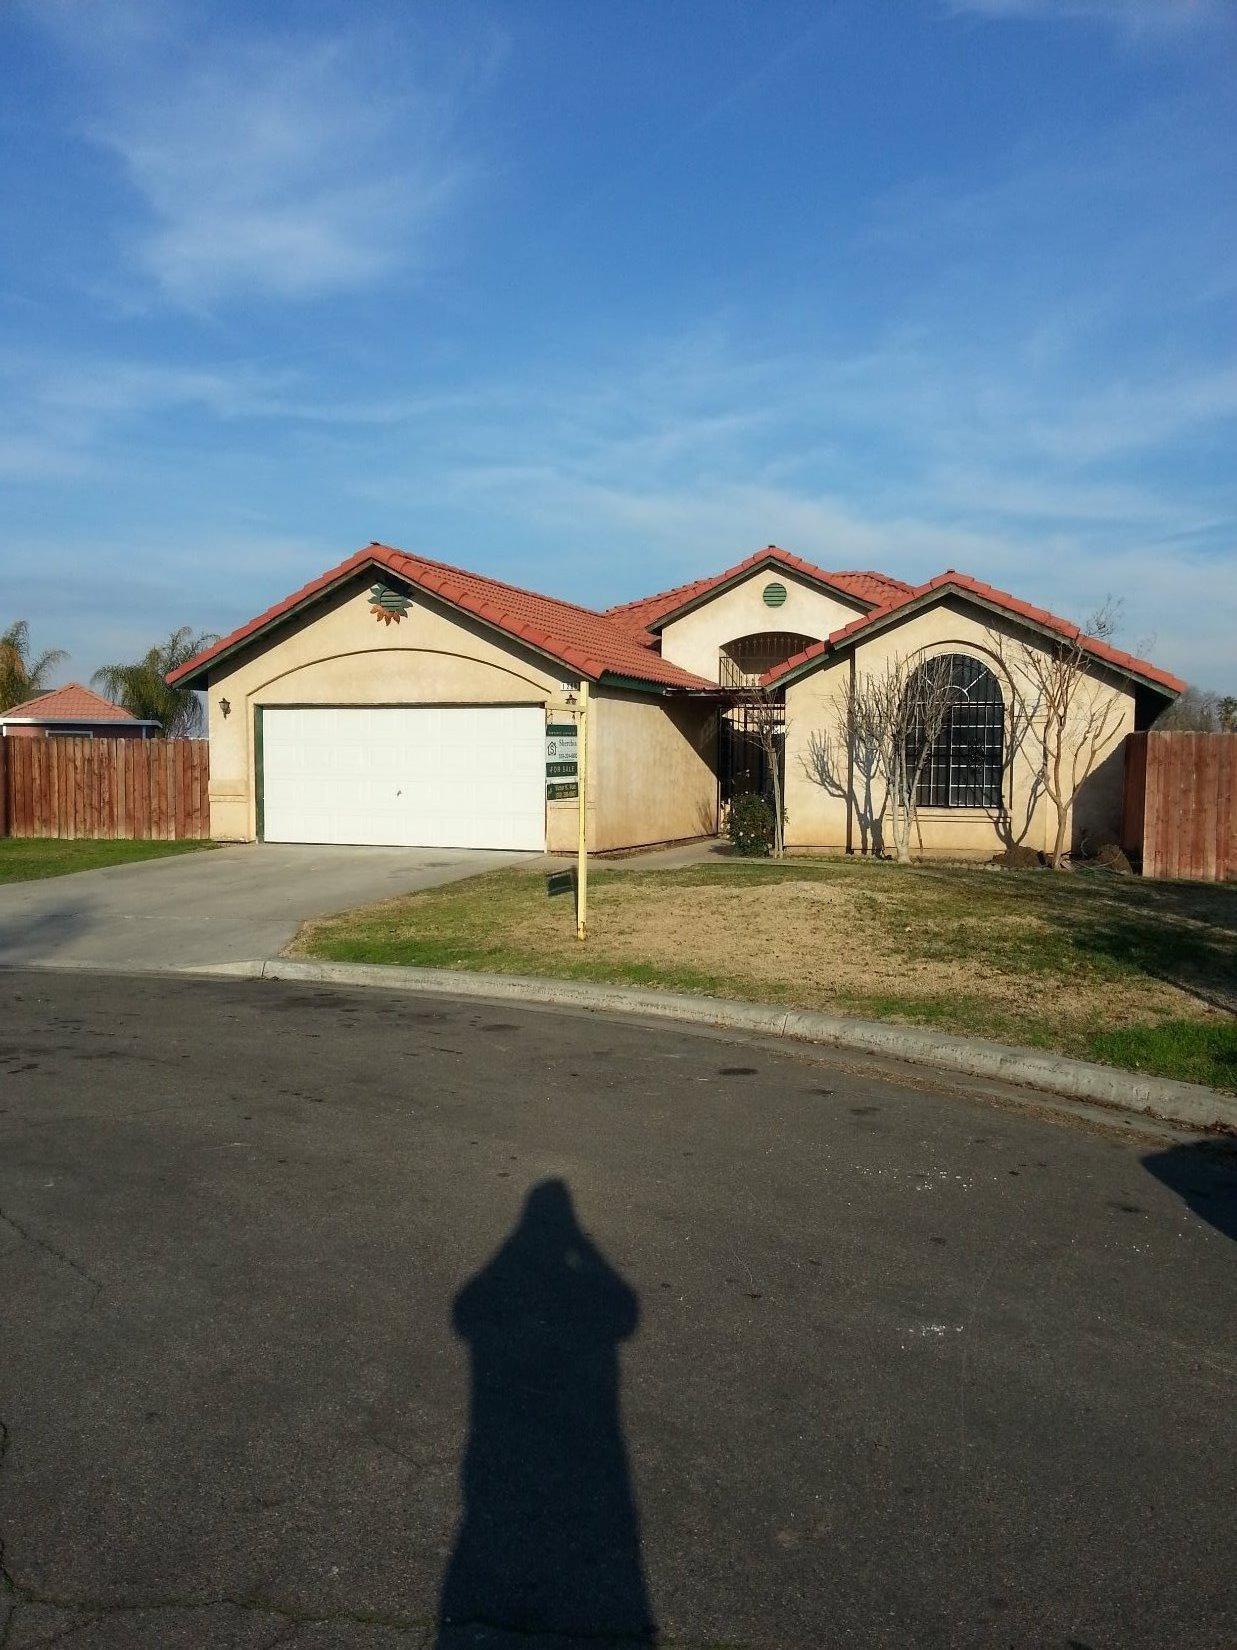 1268 N Homsy Ave, Fresno, CA